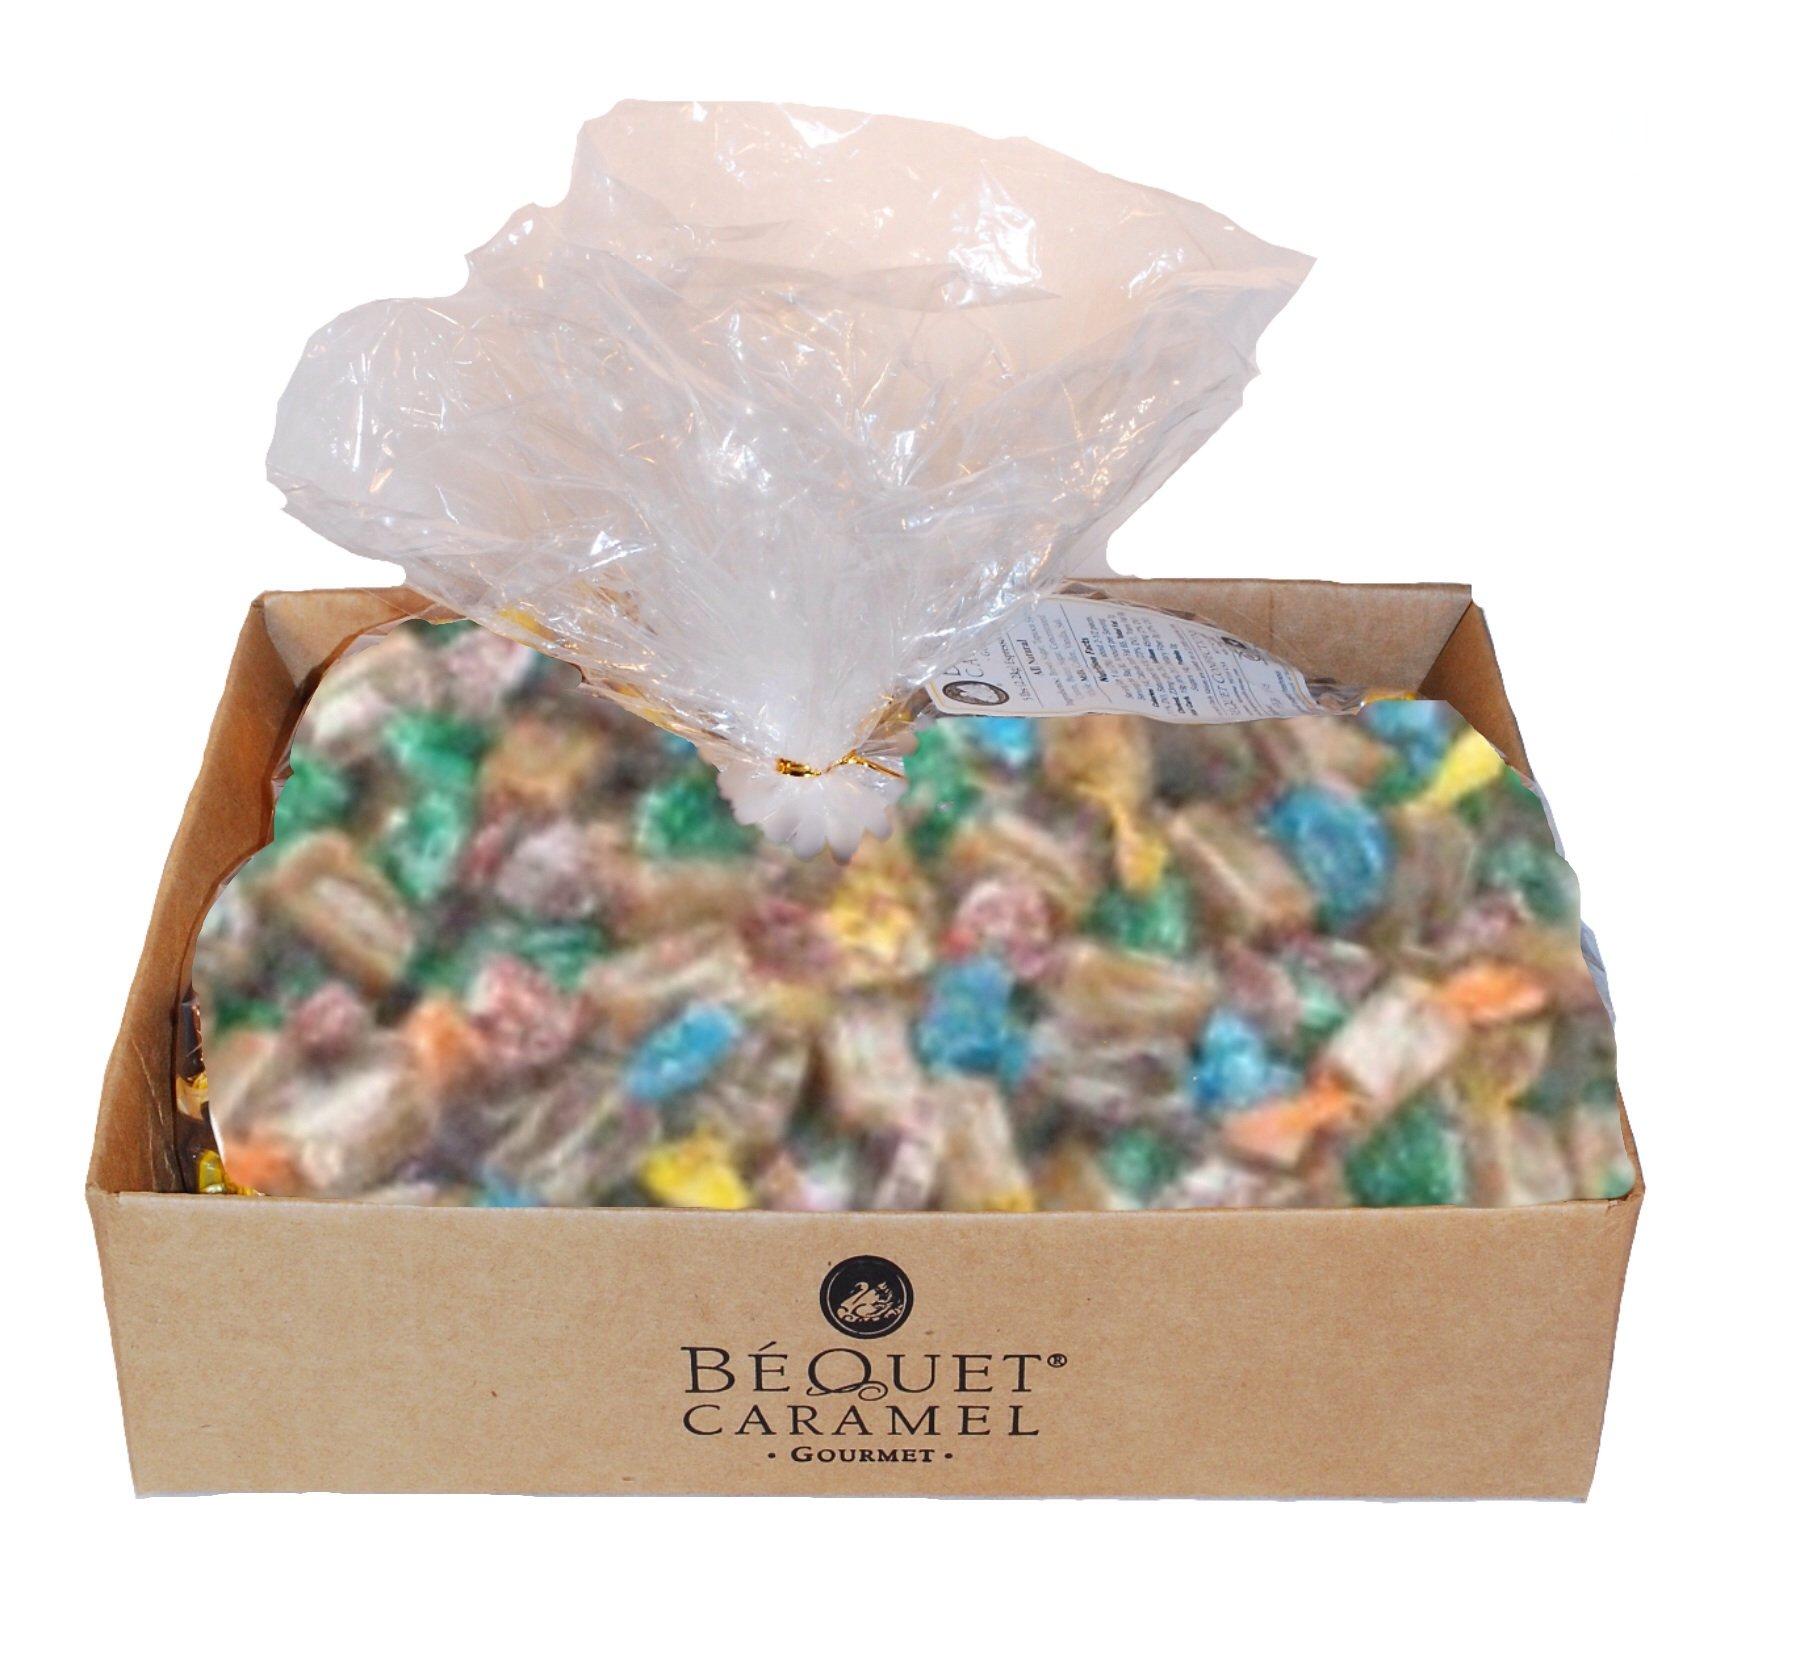 Bequet Gourmet Assorted Caramel 5lb bag (Assorted, 5lb bag) by Bequet